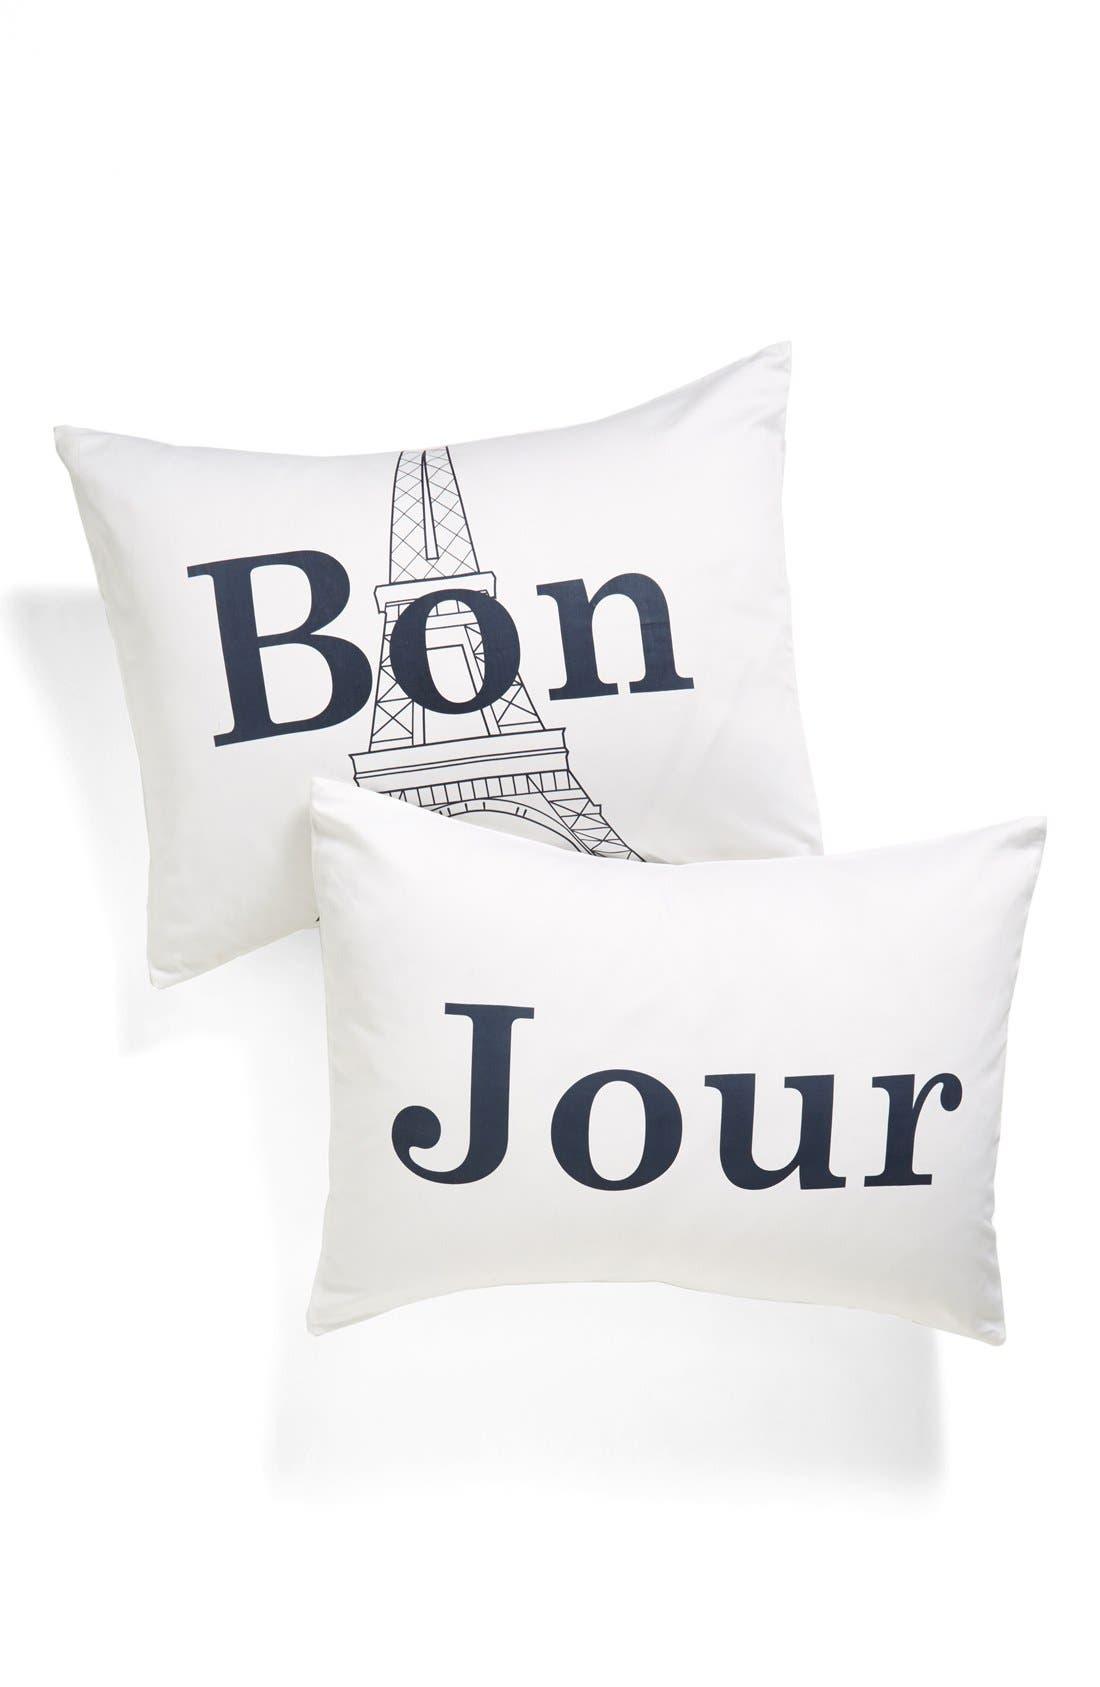 Alternate Image 1 Selected - Levtex 'Bon/Jour' Pillowcase Set